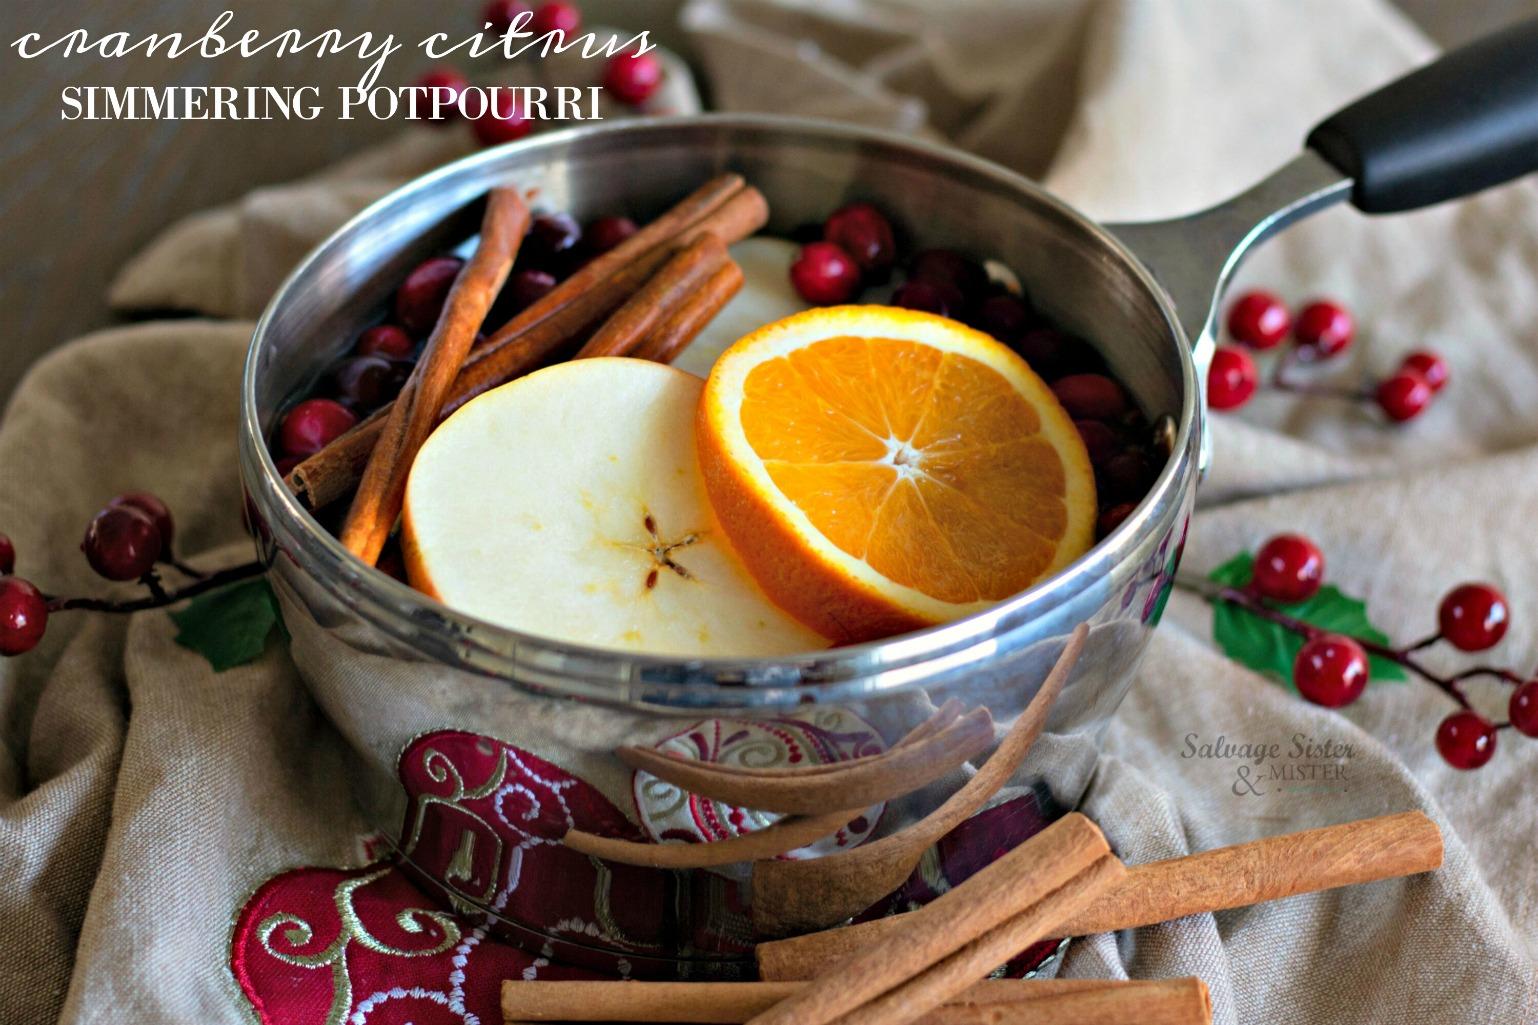 DY cranberry citrus simmering potpourri reciep on salvagesisterandmister.com